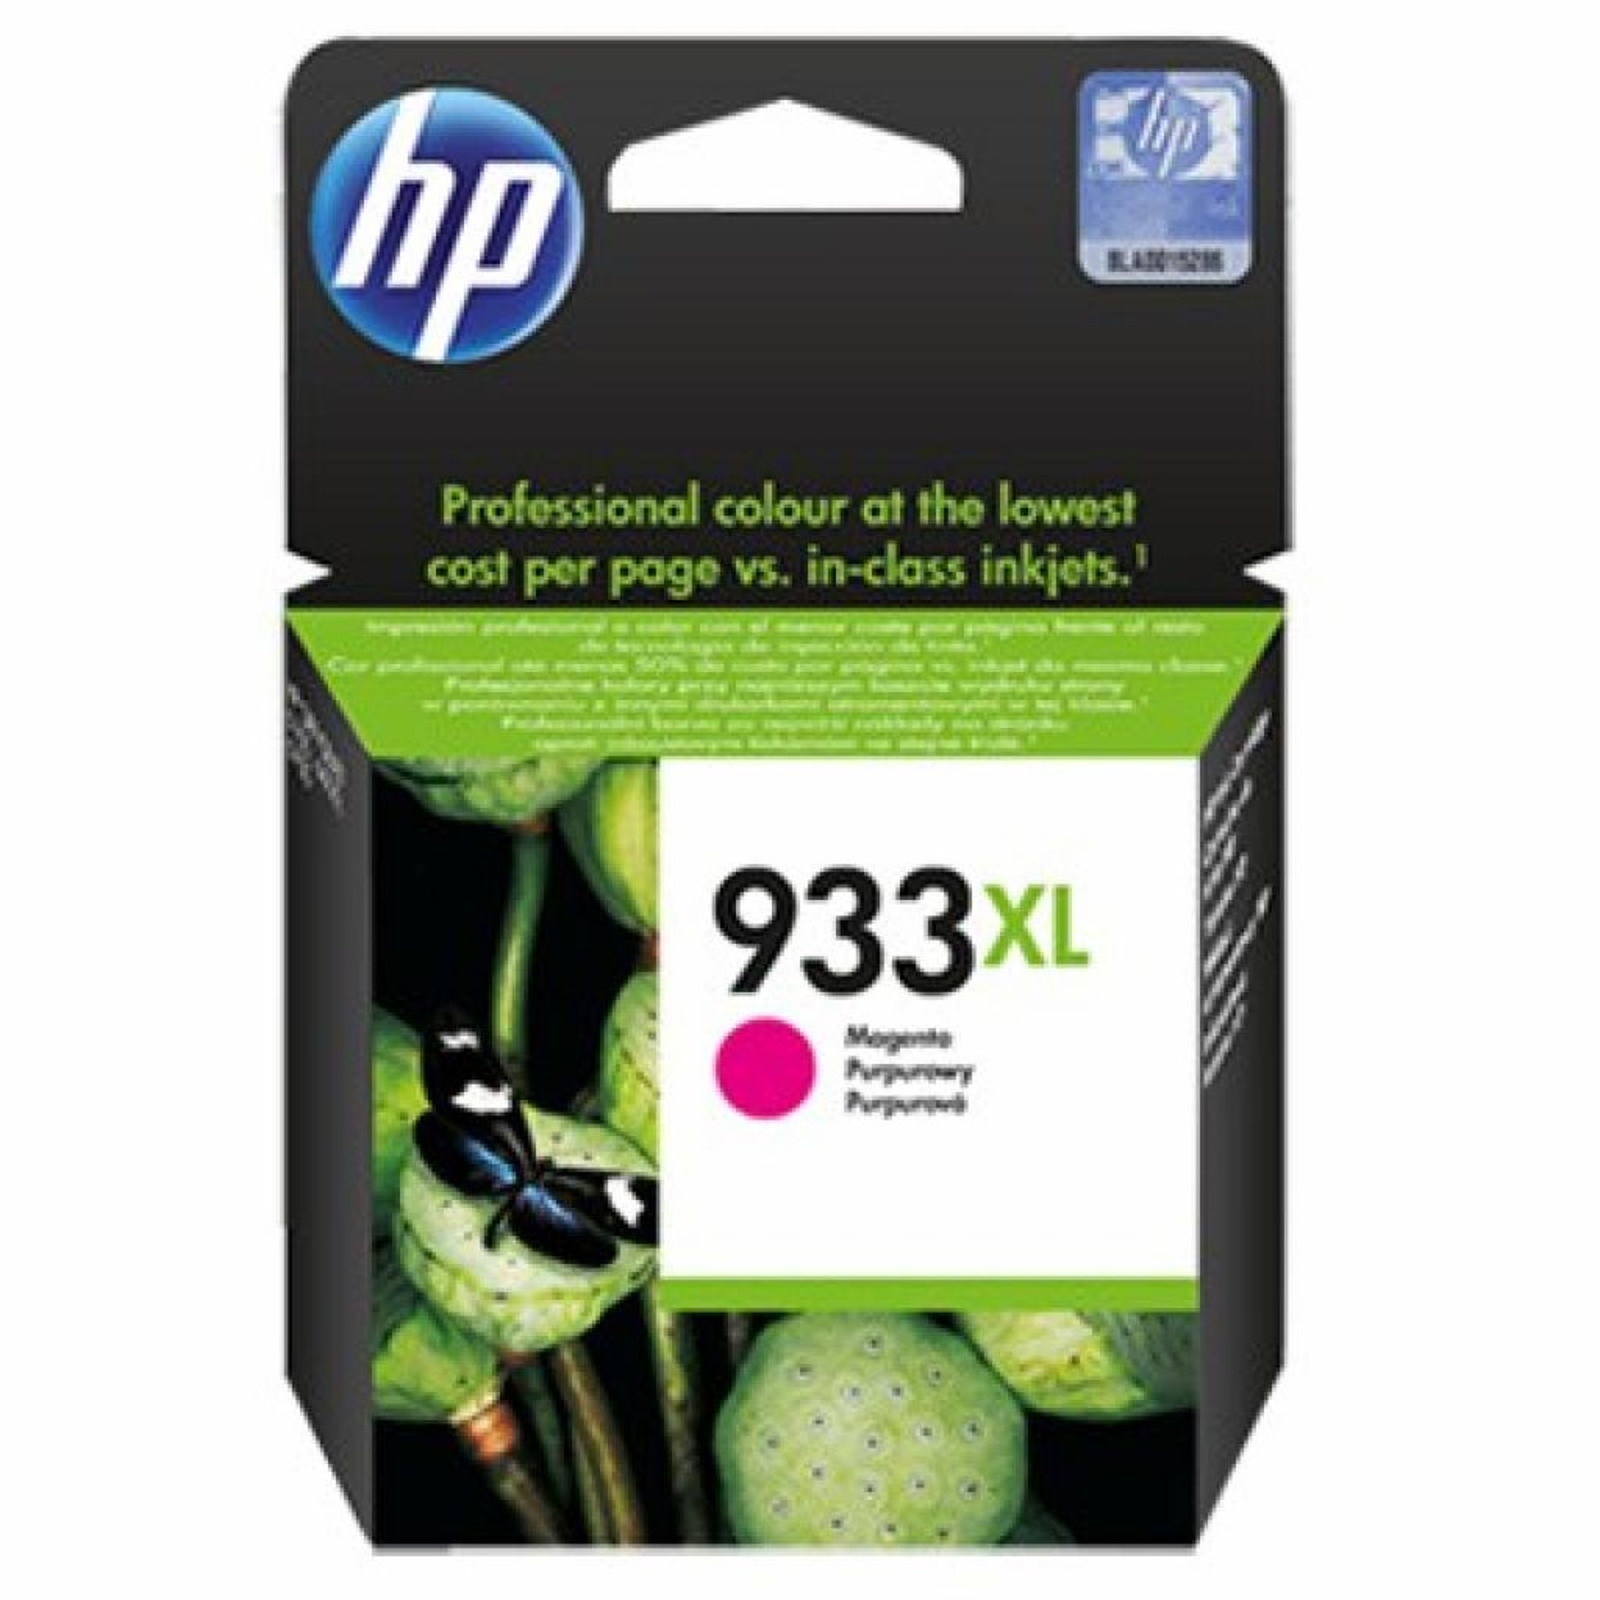 Картридж HP DJ No.933XL OJ 6700 Premium Magenta (CN055AE)